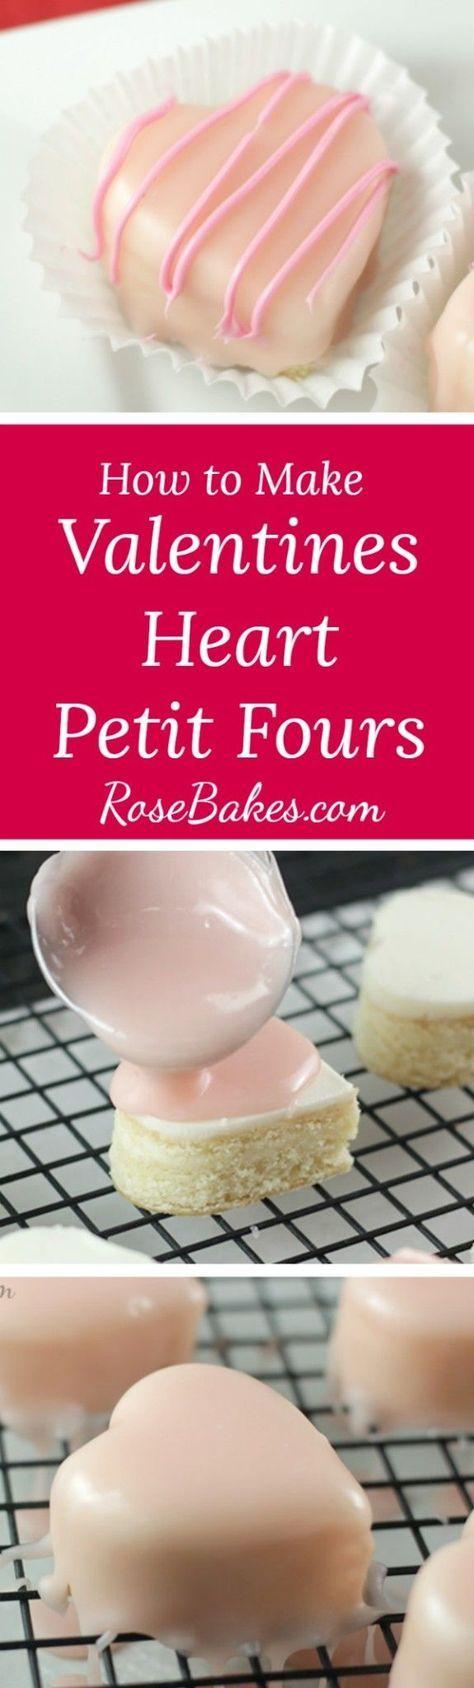 How to Make Valentines Heart Petit Fours RoseBakes